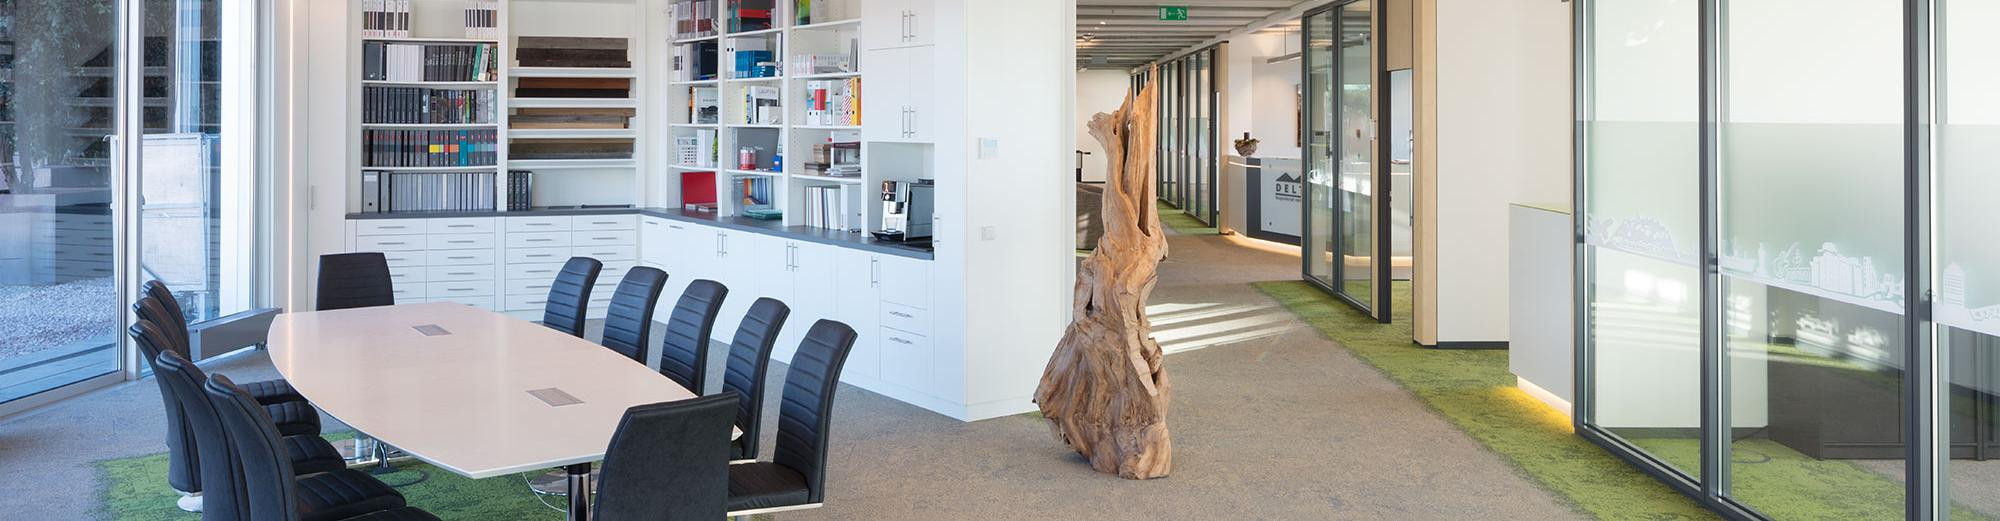 bauunternehmen in hamburg in vebidoobiz finden. Black Bedroom Furniture Sets. Home Design Ideas